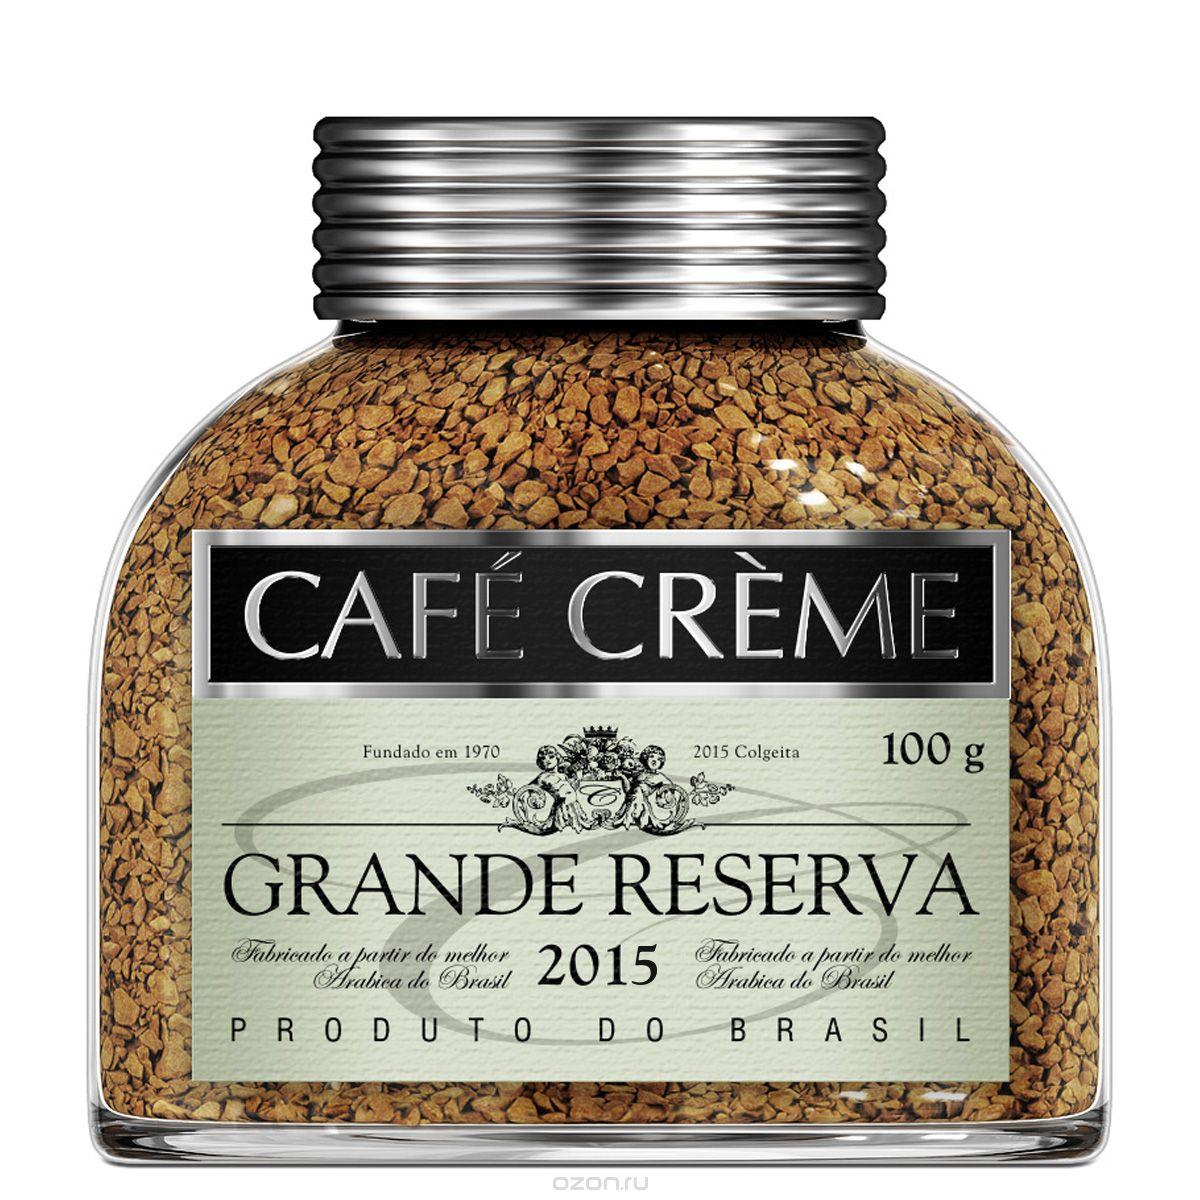 Cafe Creme Grande Reserva кофе растворимый, 100 г cotton ralph mesa grande